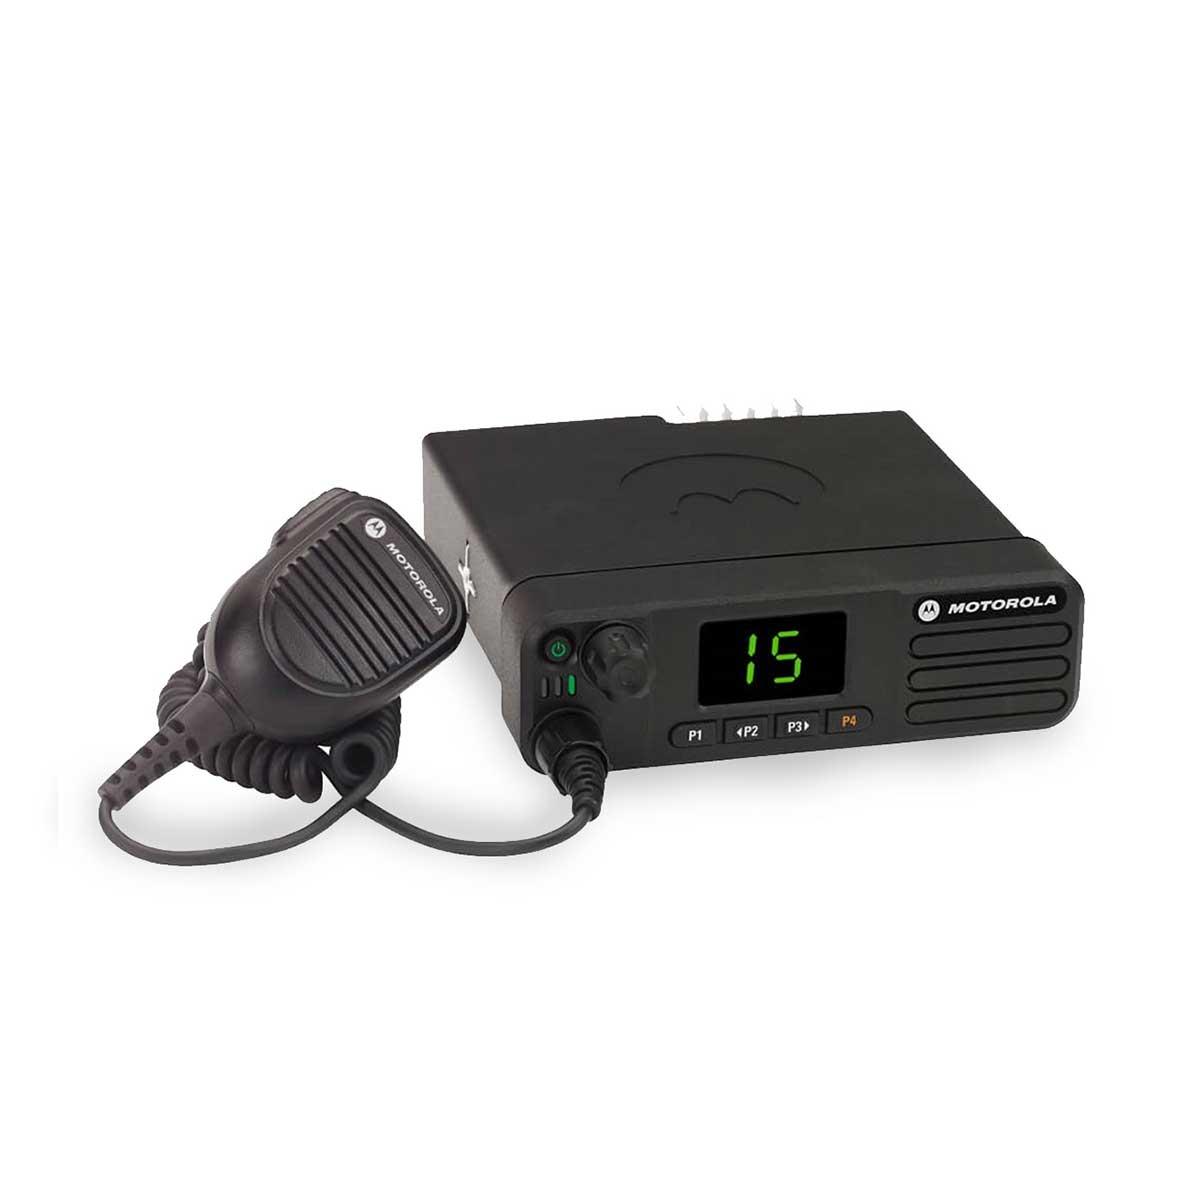 Radio Motorola DGM5000 Digital LAM28JQC9MA1AN VHF 136-174 MHZ de 45W